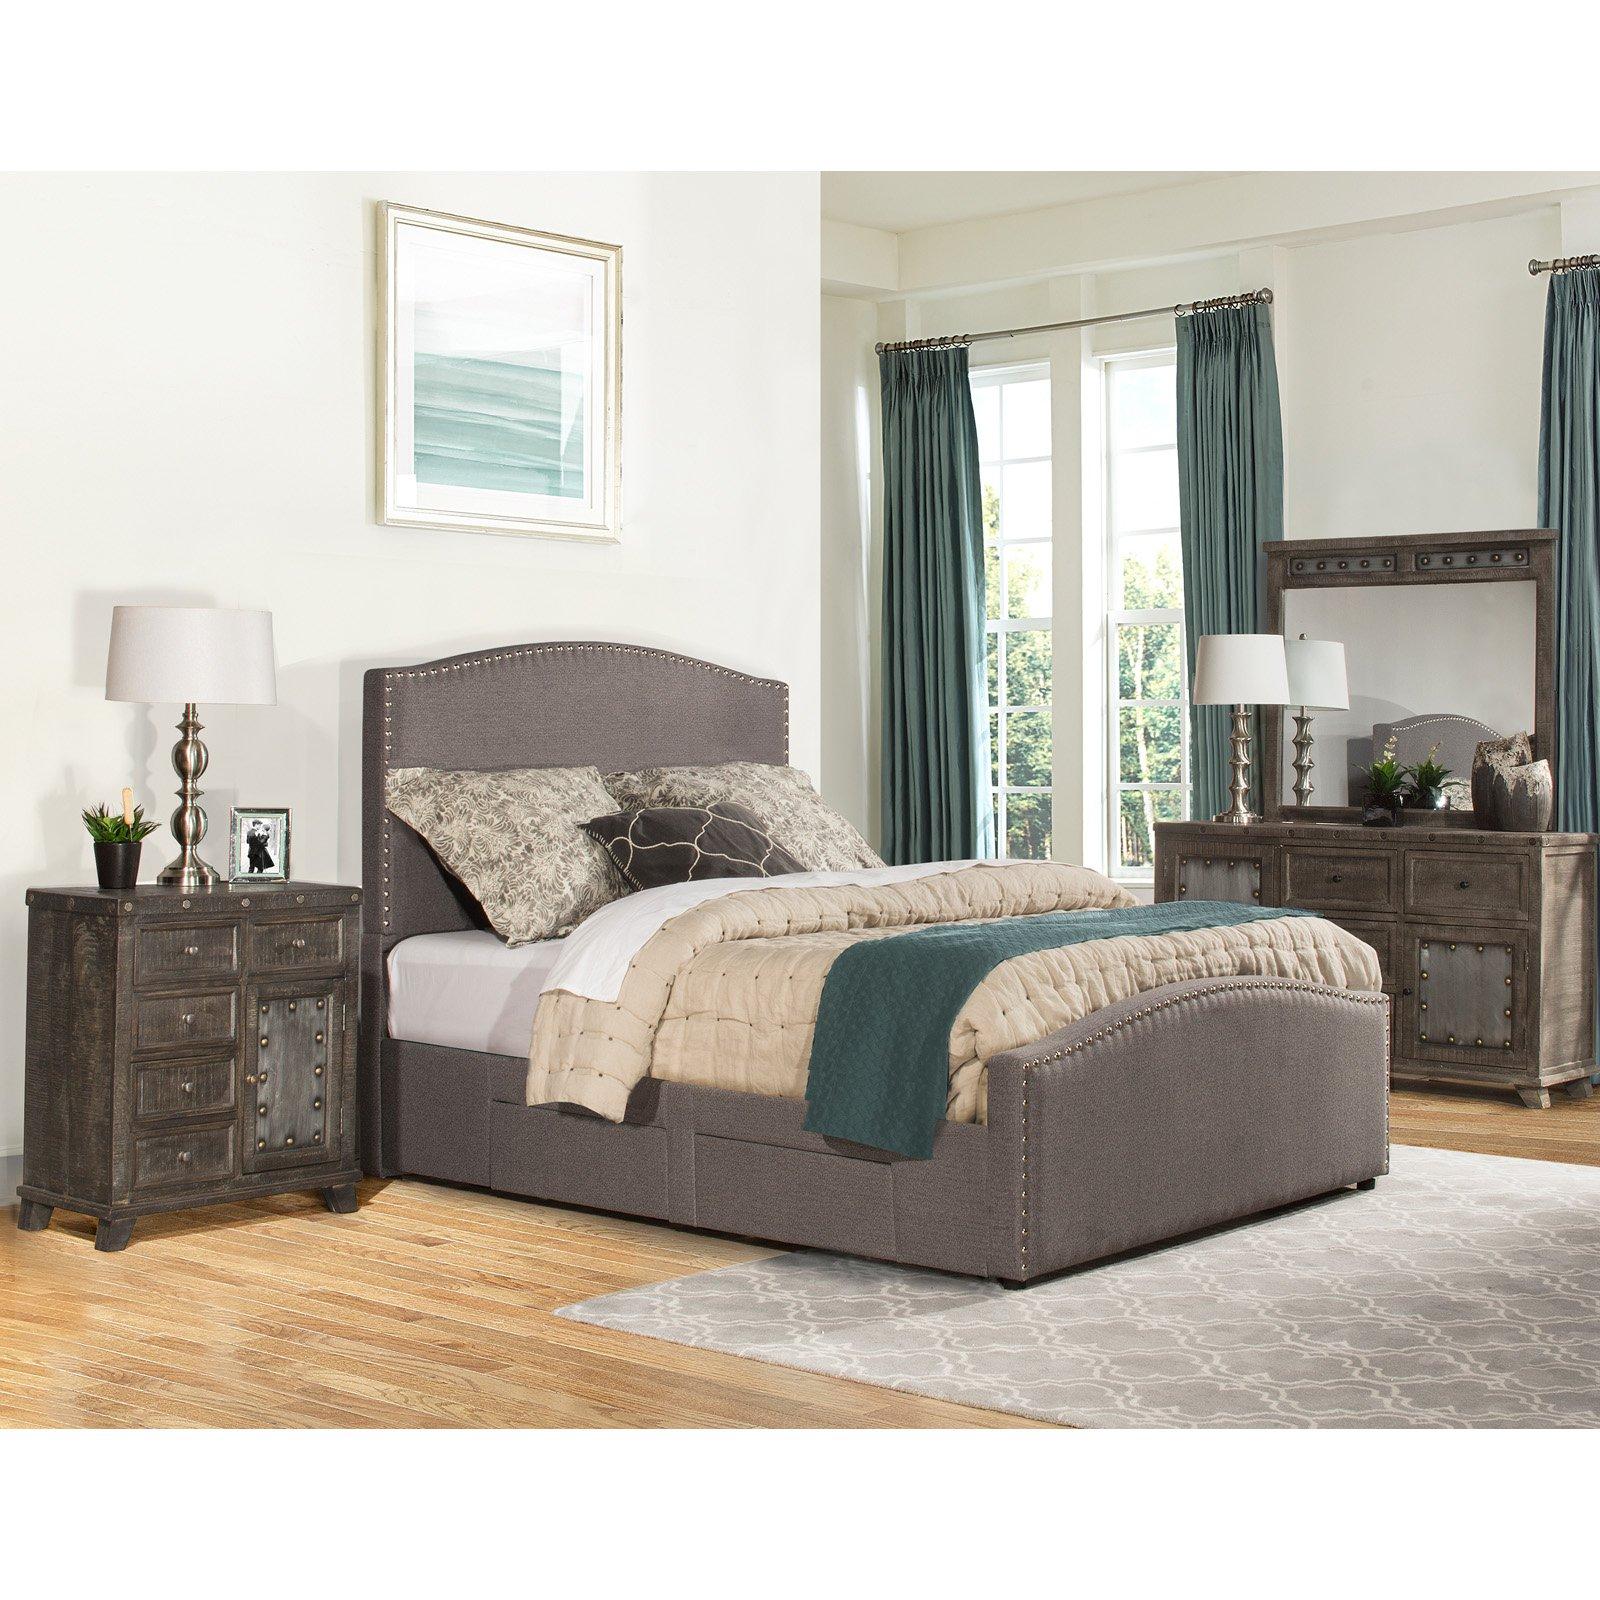 Hillsdale Kerstein Upholstered Storage Panel Bed